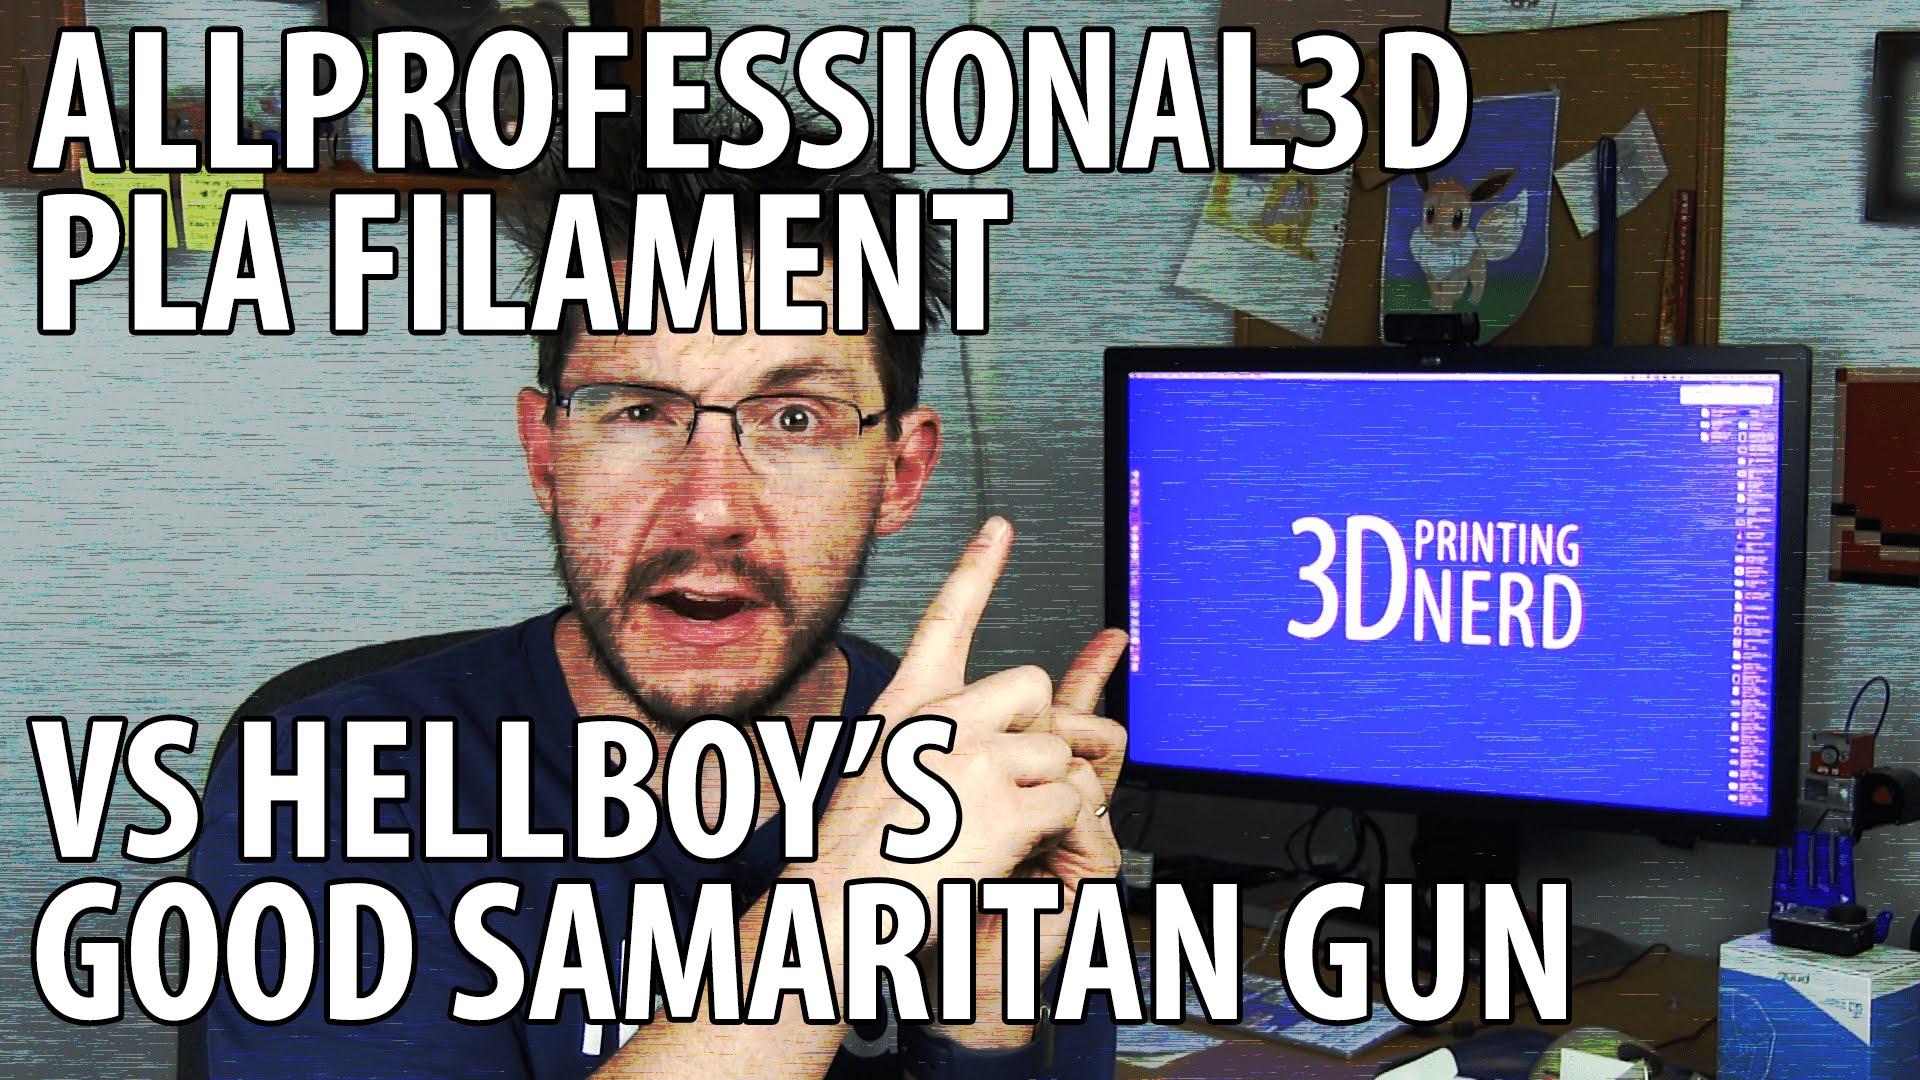 3D Printing Hellboy's Good Samaritan Gun with AllProfessional3D filament